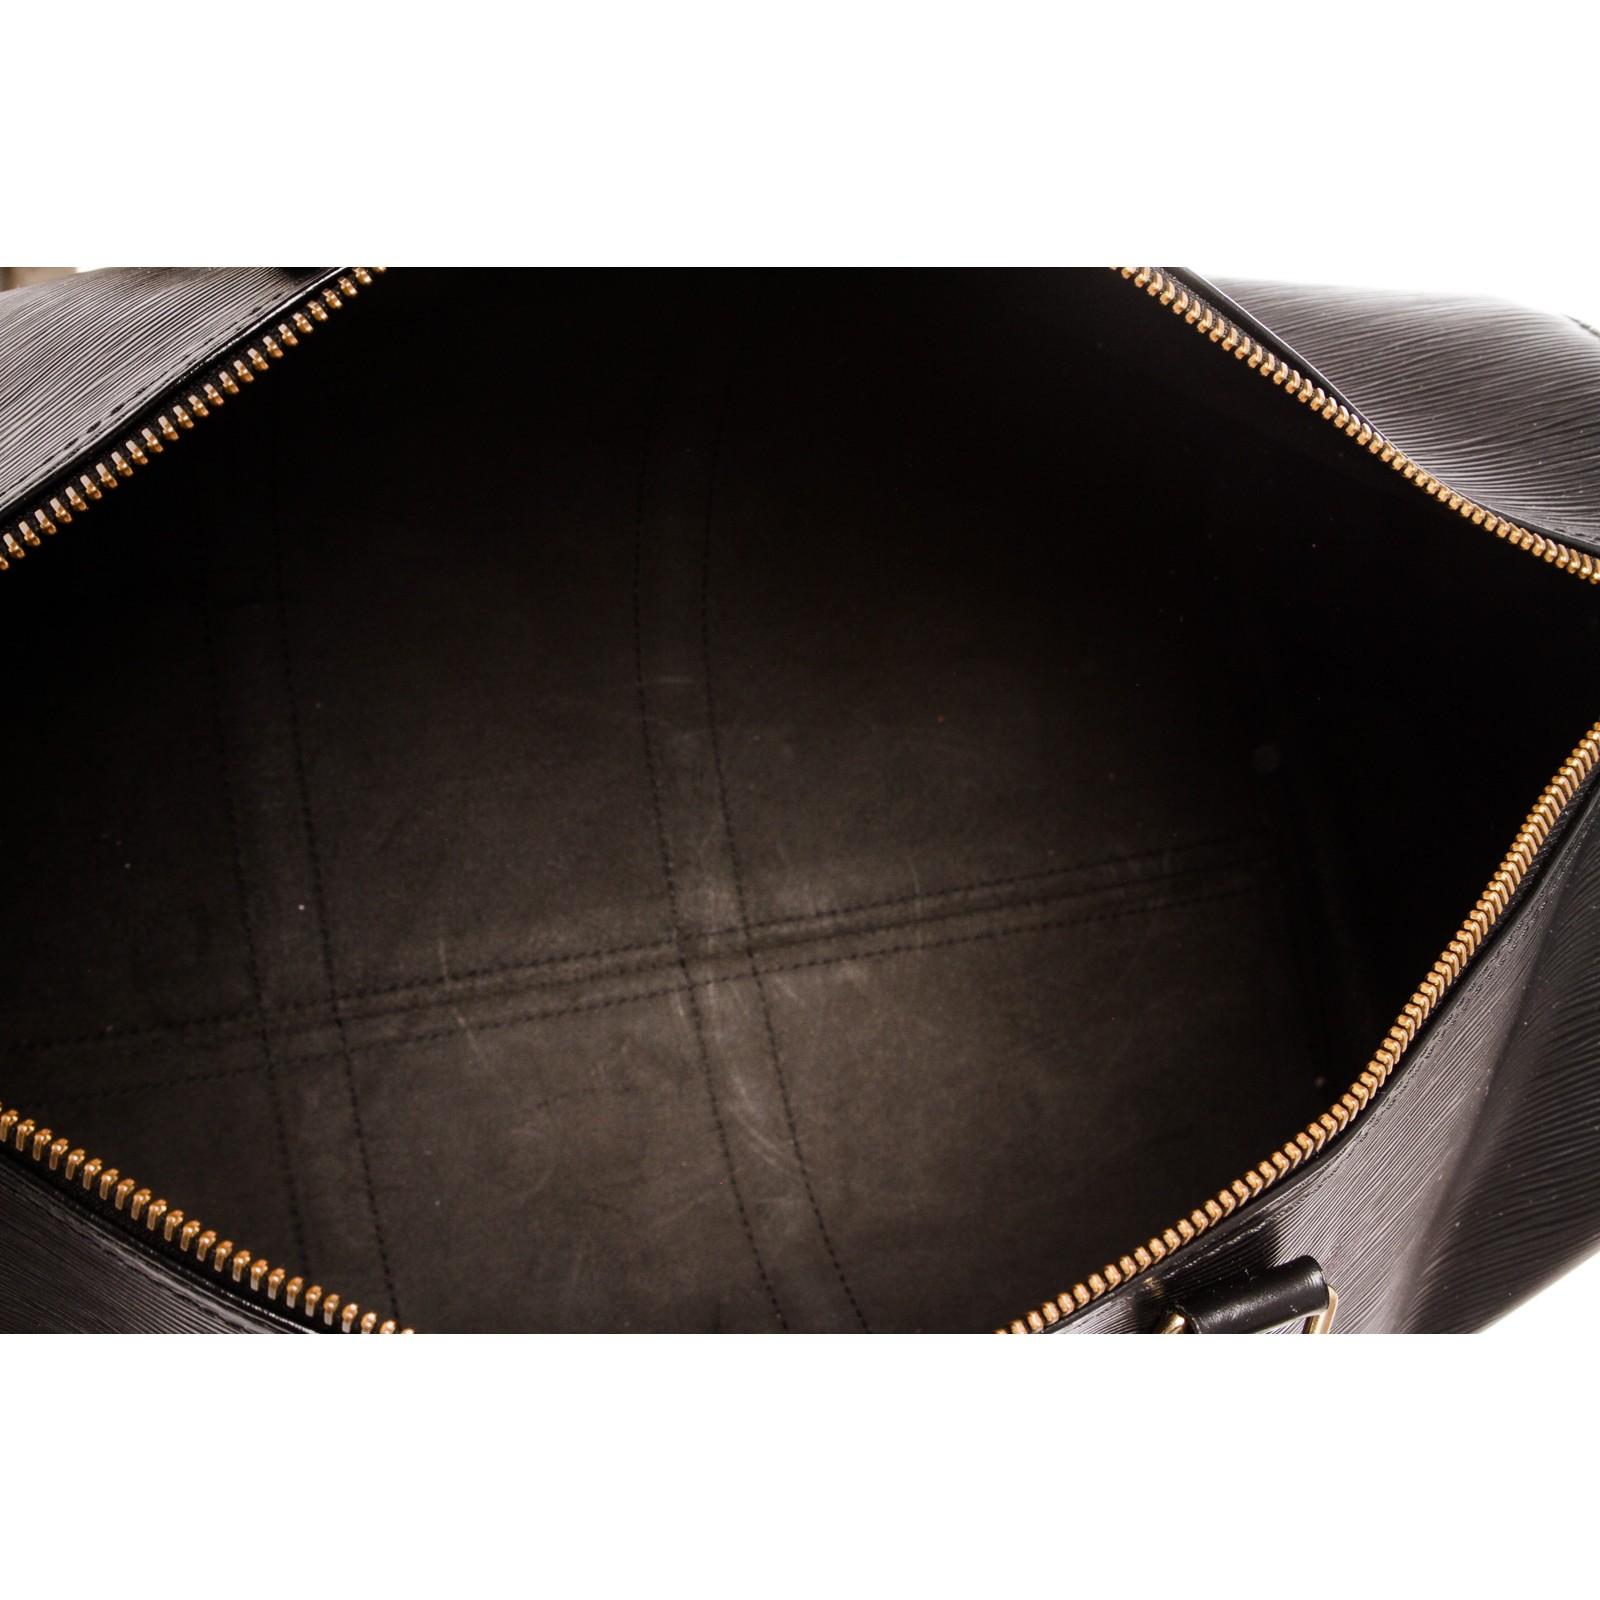 31feaa2316e Louis Vuitton Black Epi Leather Keepall 55 cm Duffle Bag Luggage